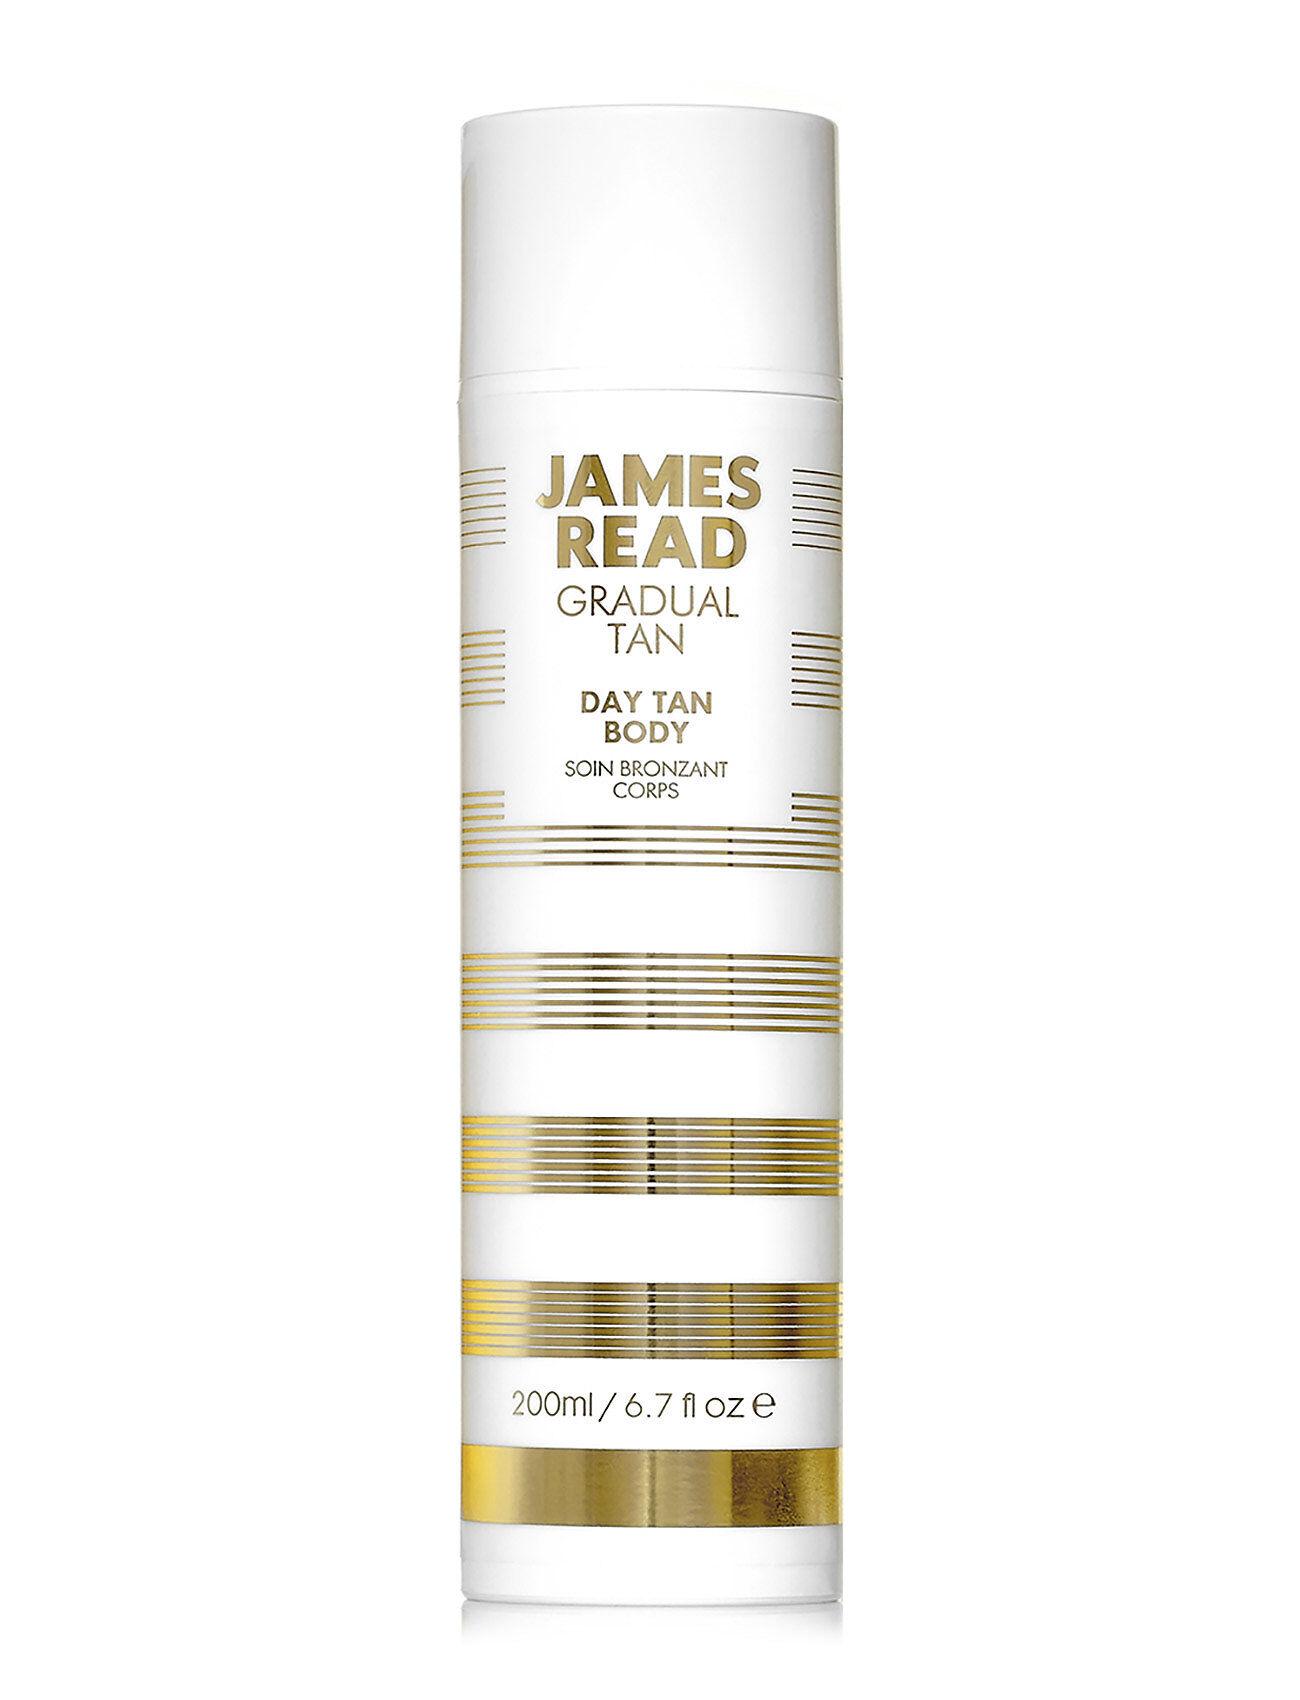 James Read Gradual Day Tan Body Beauty WOMEN Skin Care Sun Products Self Tanners Nude James Read